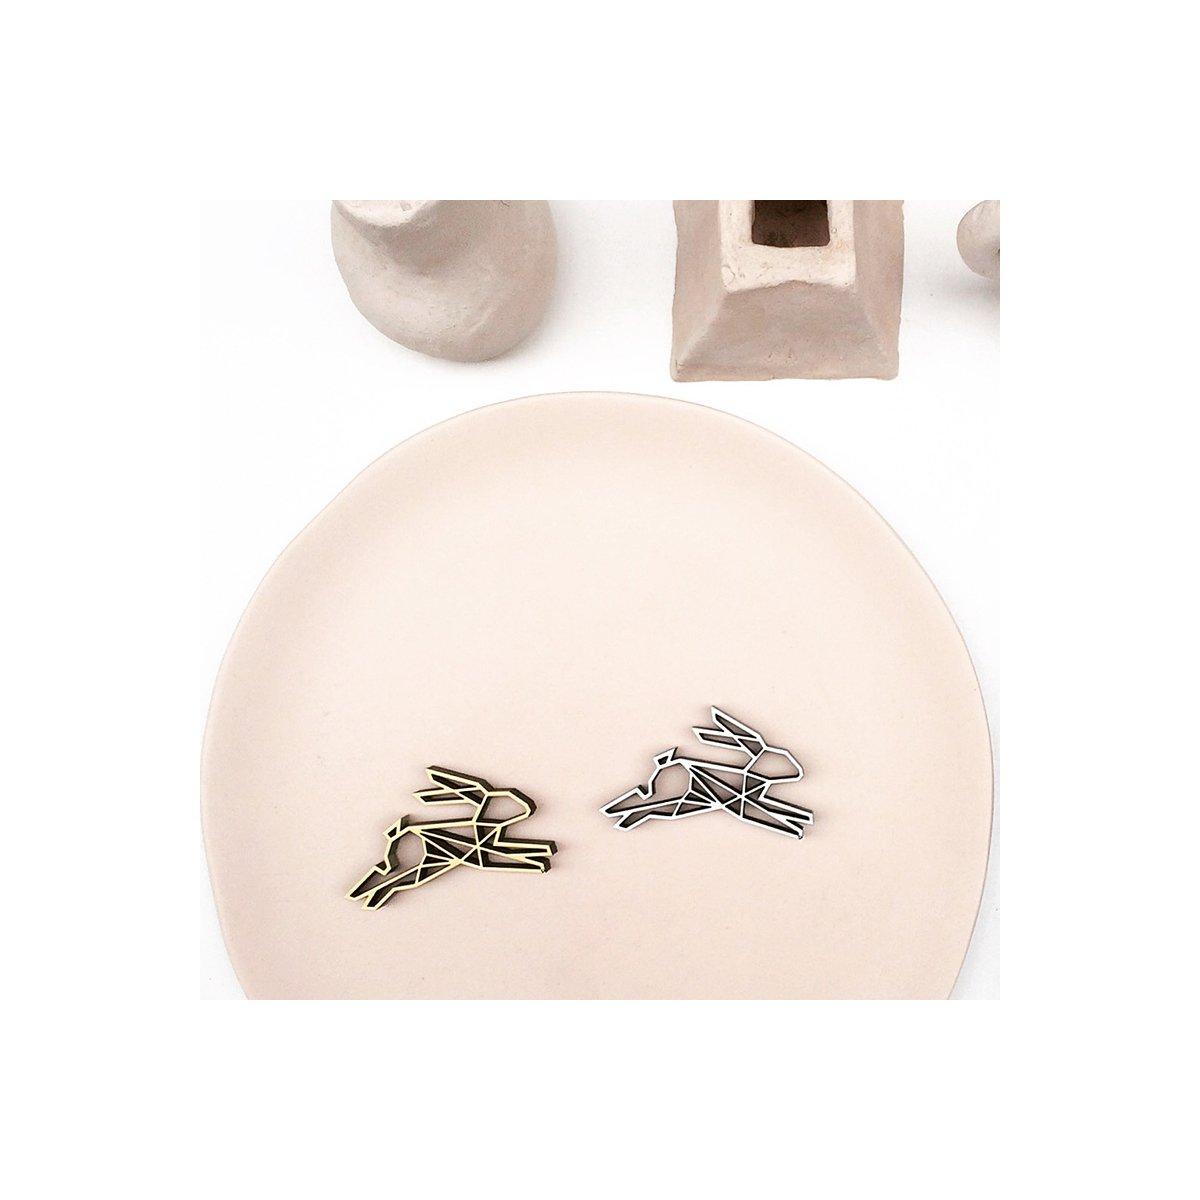 Hase, 9,50 € - NOGALLERY - 3D Holzschriftzüge - das Original, ma